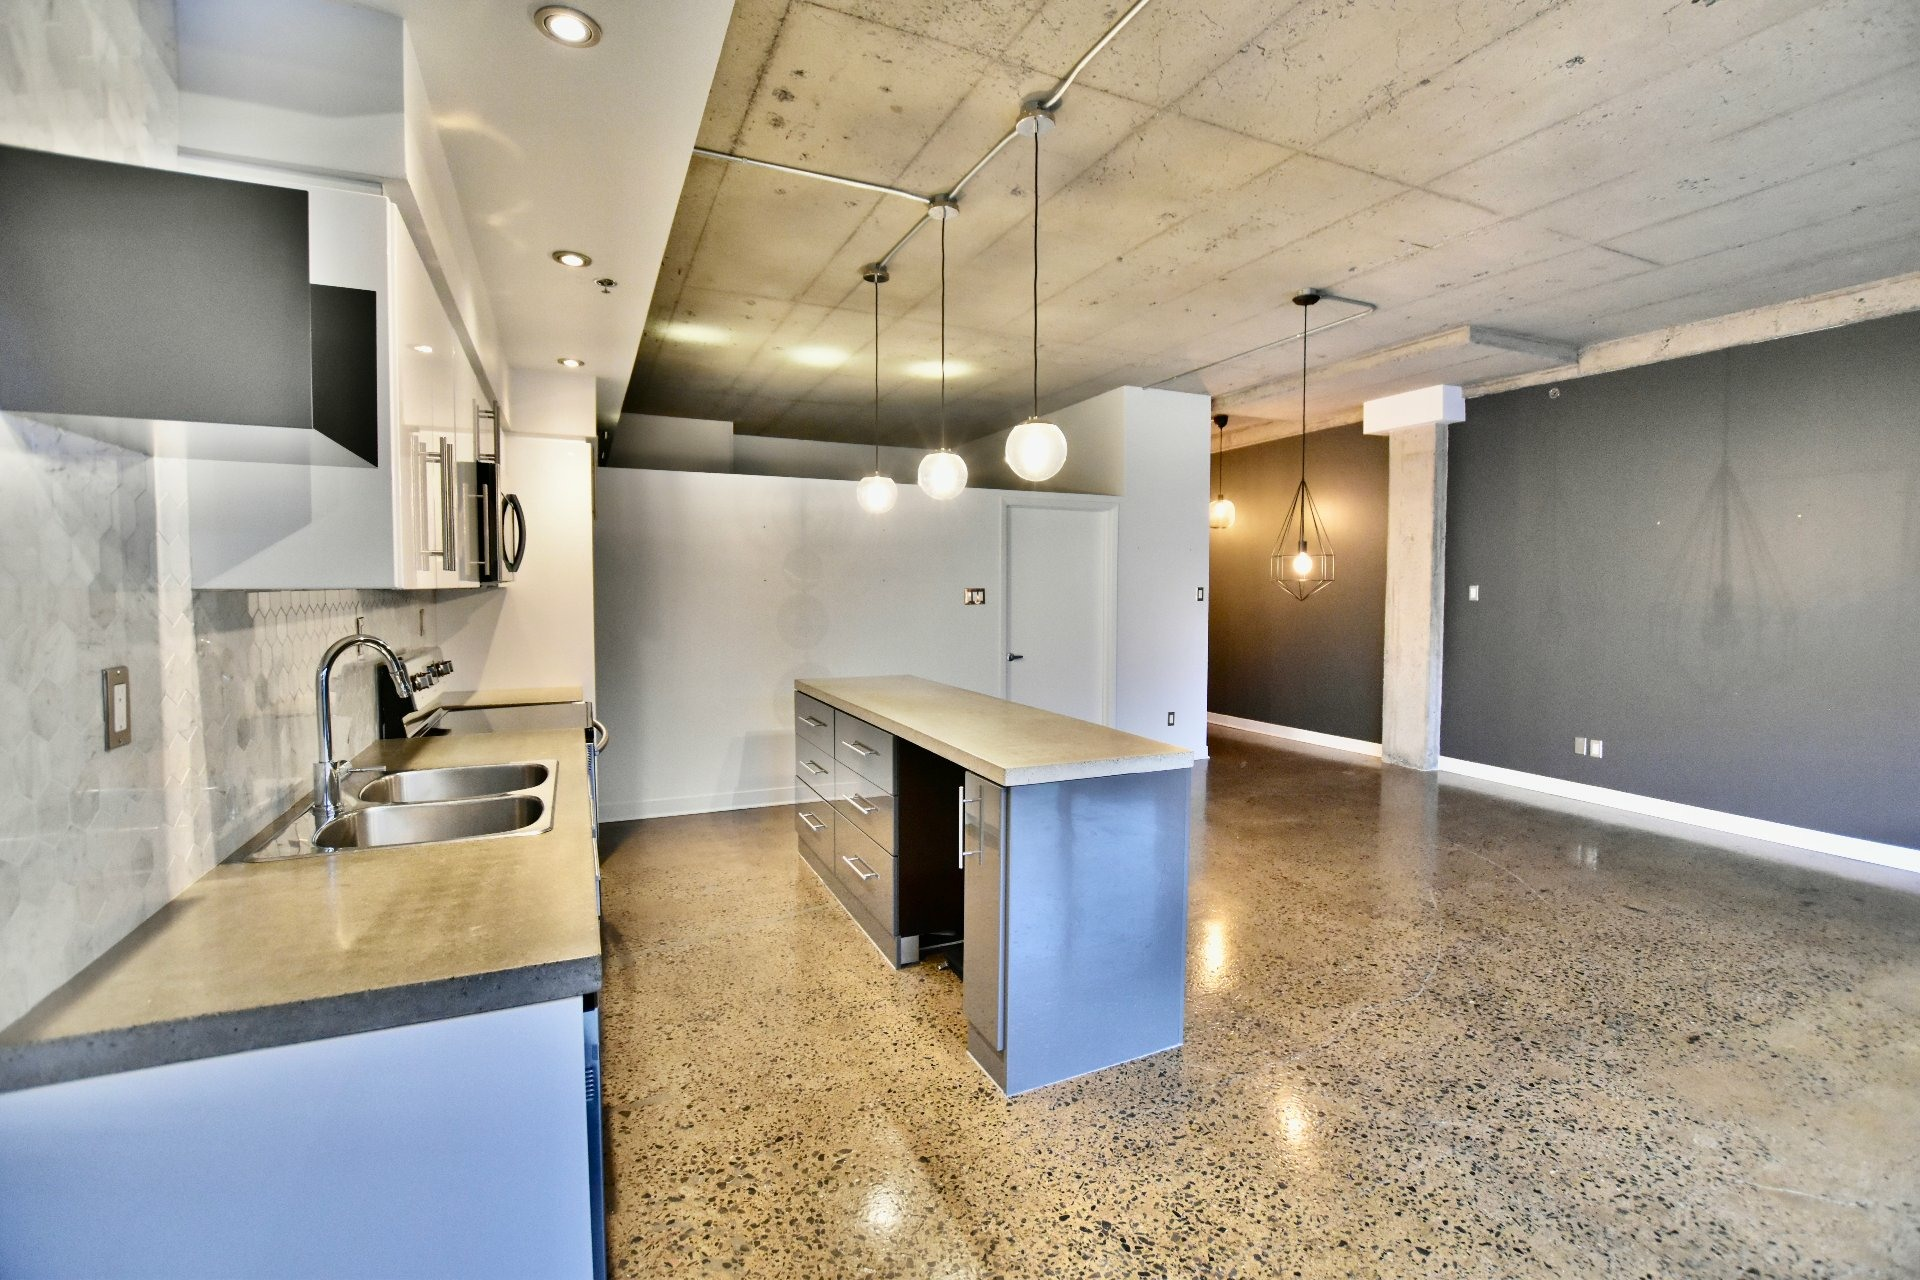 image 5 - Departamento Para alquiler Villeray/Saint-Michel/Parc-Extension Montréal  - 5 habitaciones